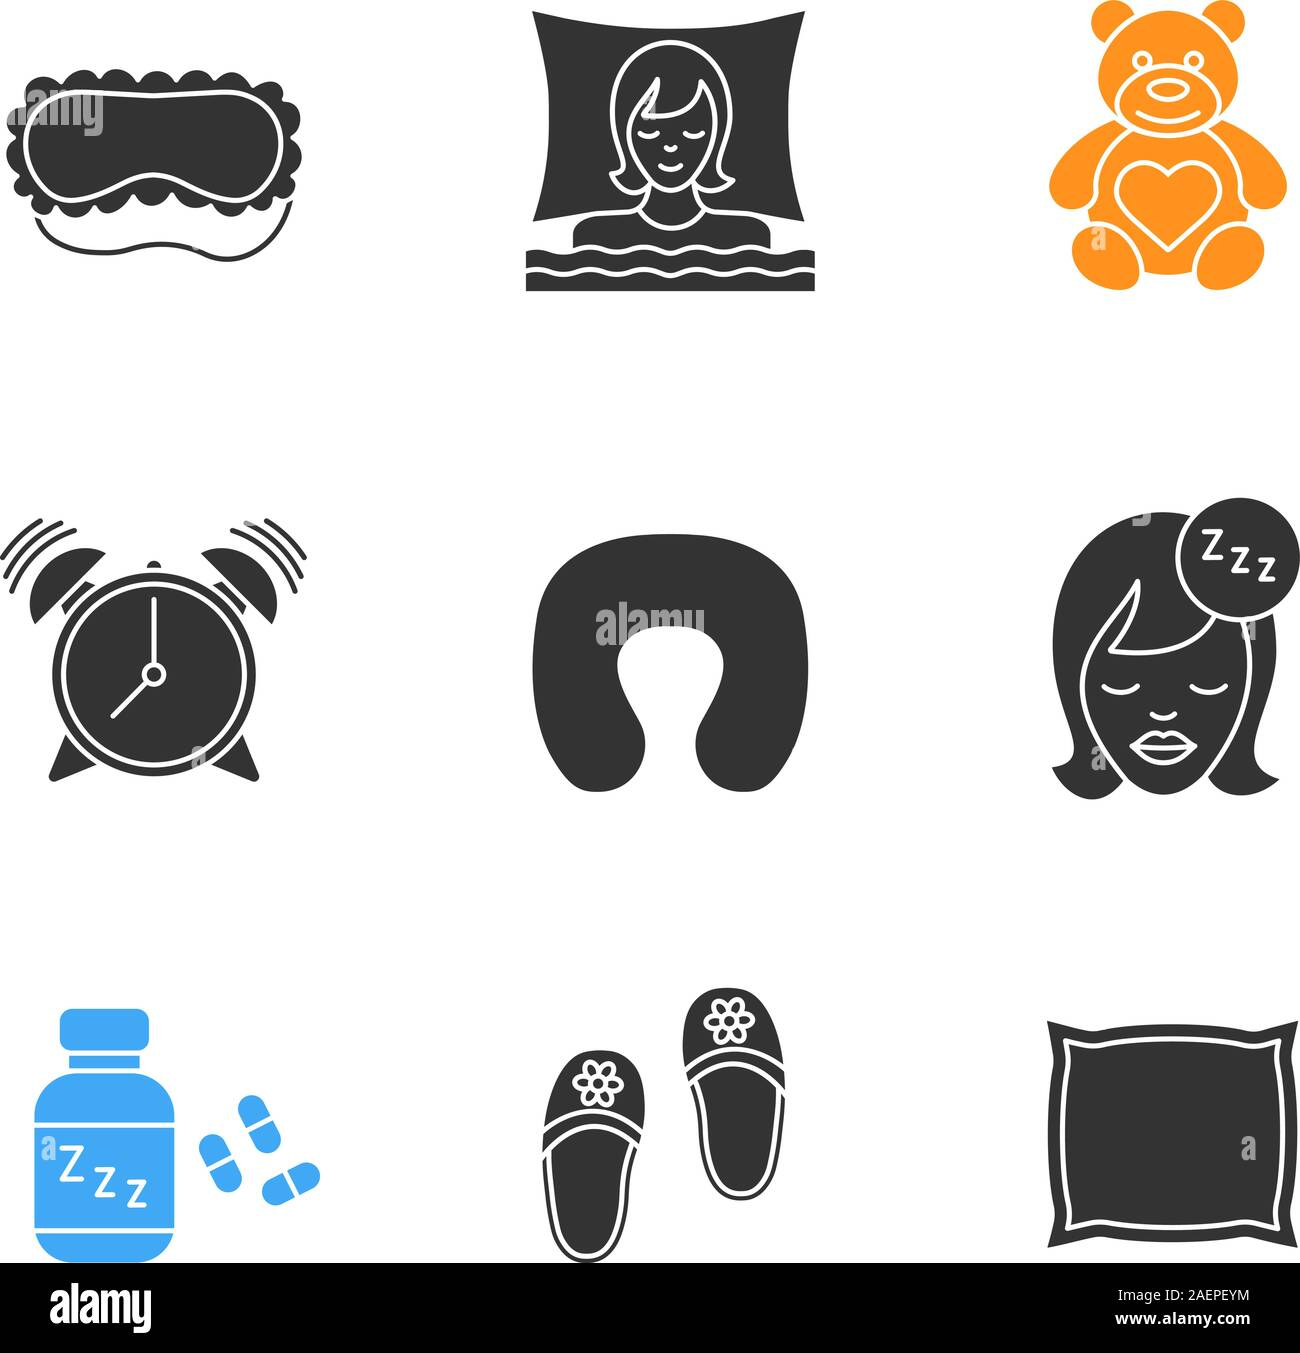 Sleeping Accessories Glyph Icons Set Sleeping Women Mask Teddy Bear Alarm Clock Pillows Soporific Bedroom Slippers Silhouette Symbols Vector Stock Vector Image Art Alamy